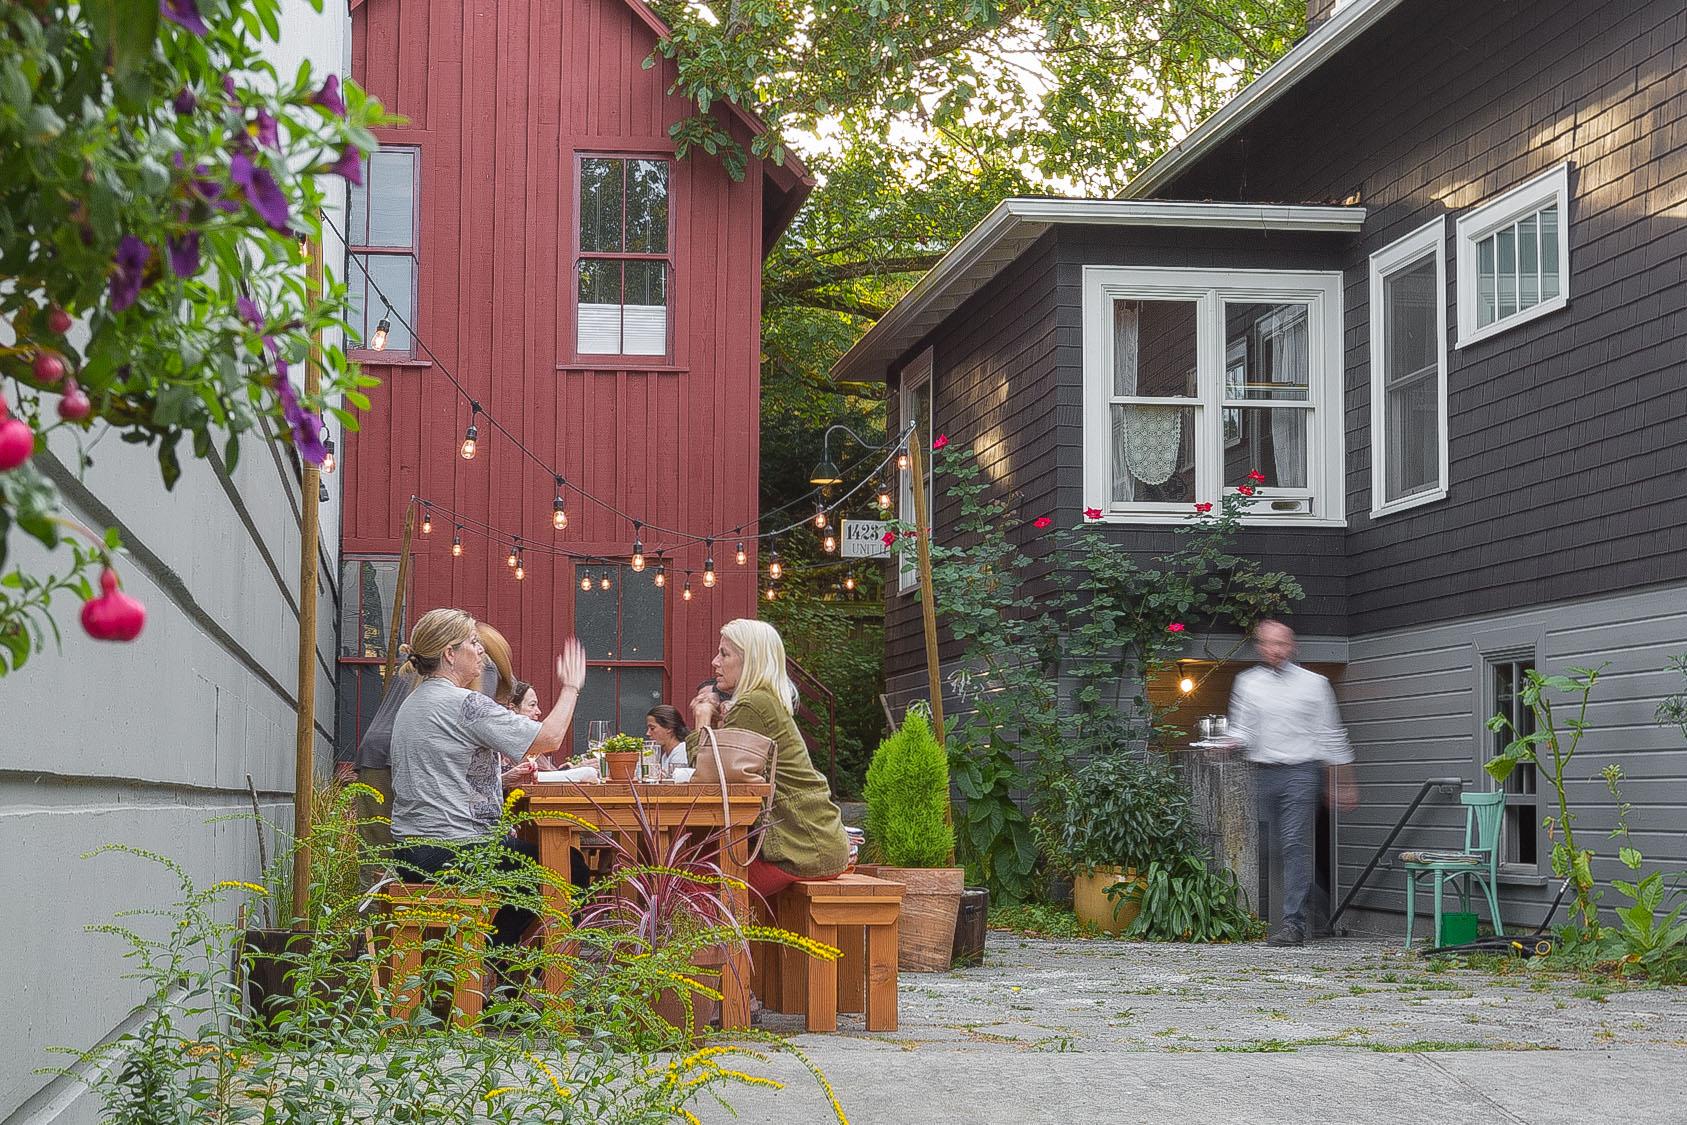 Red Cow Restaurant Courtyard